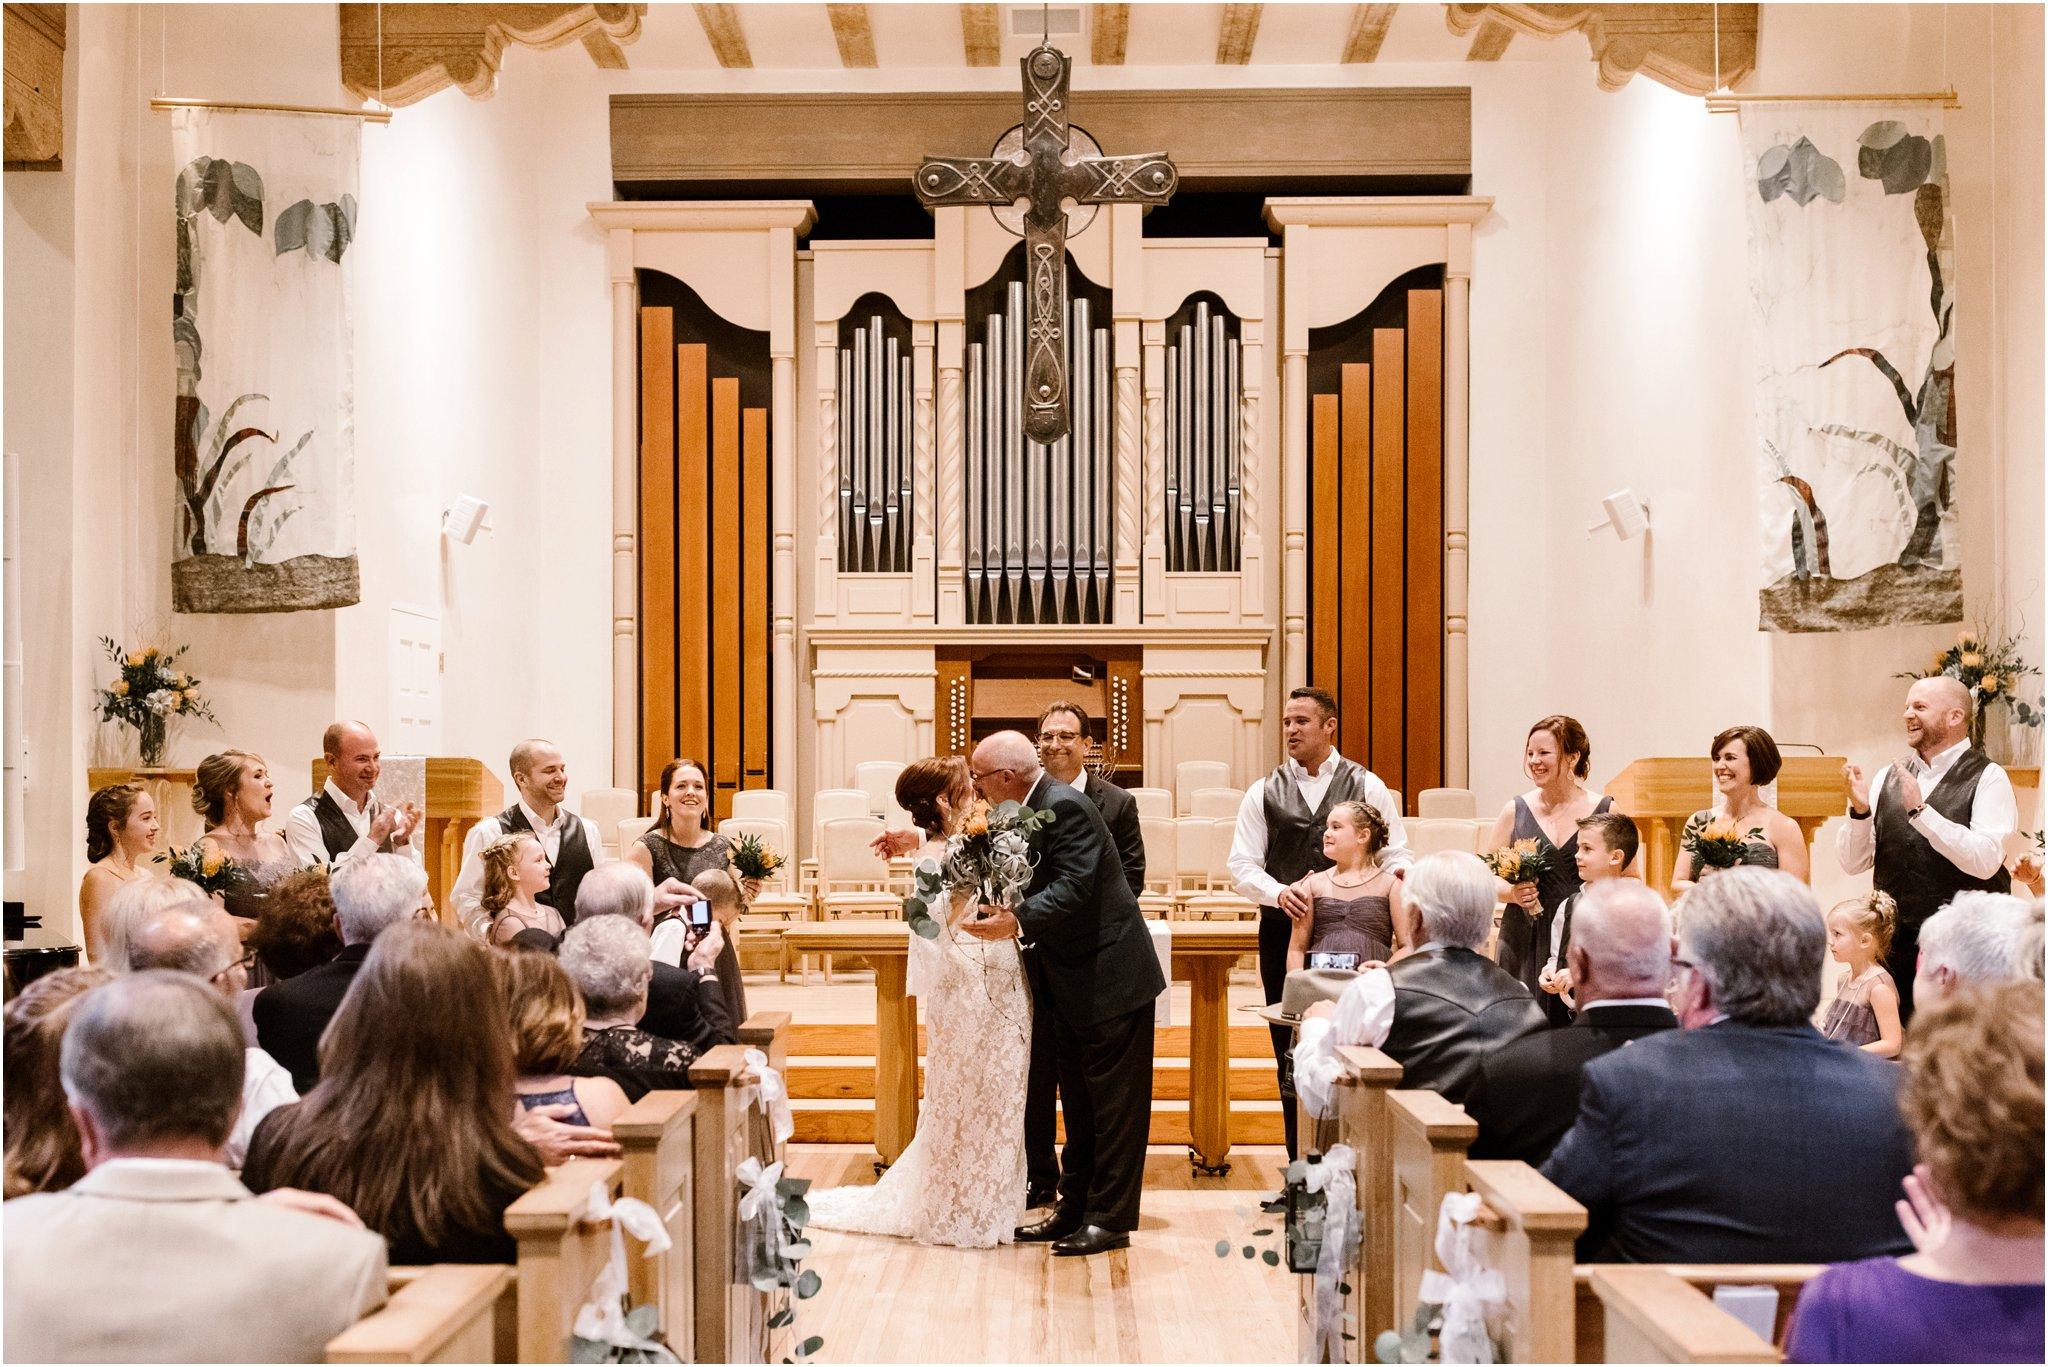 0032Santa Fe Wedding _Inn and Spa at Loretto Wedding, Inn and Spa at Loretto wedding, Santa Fe wedding photographers, blue rose photography